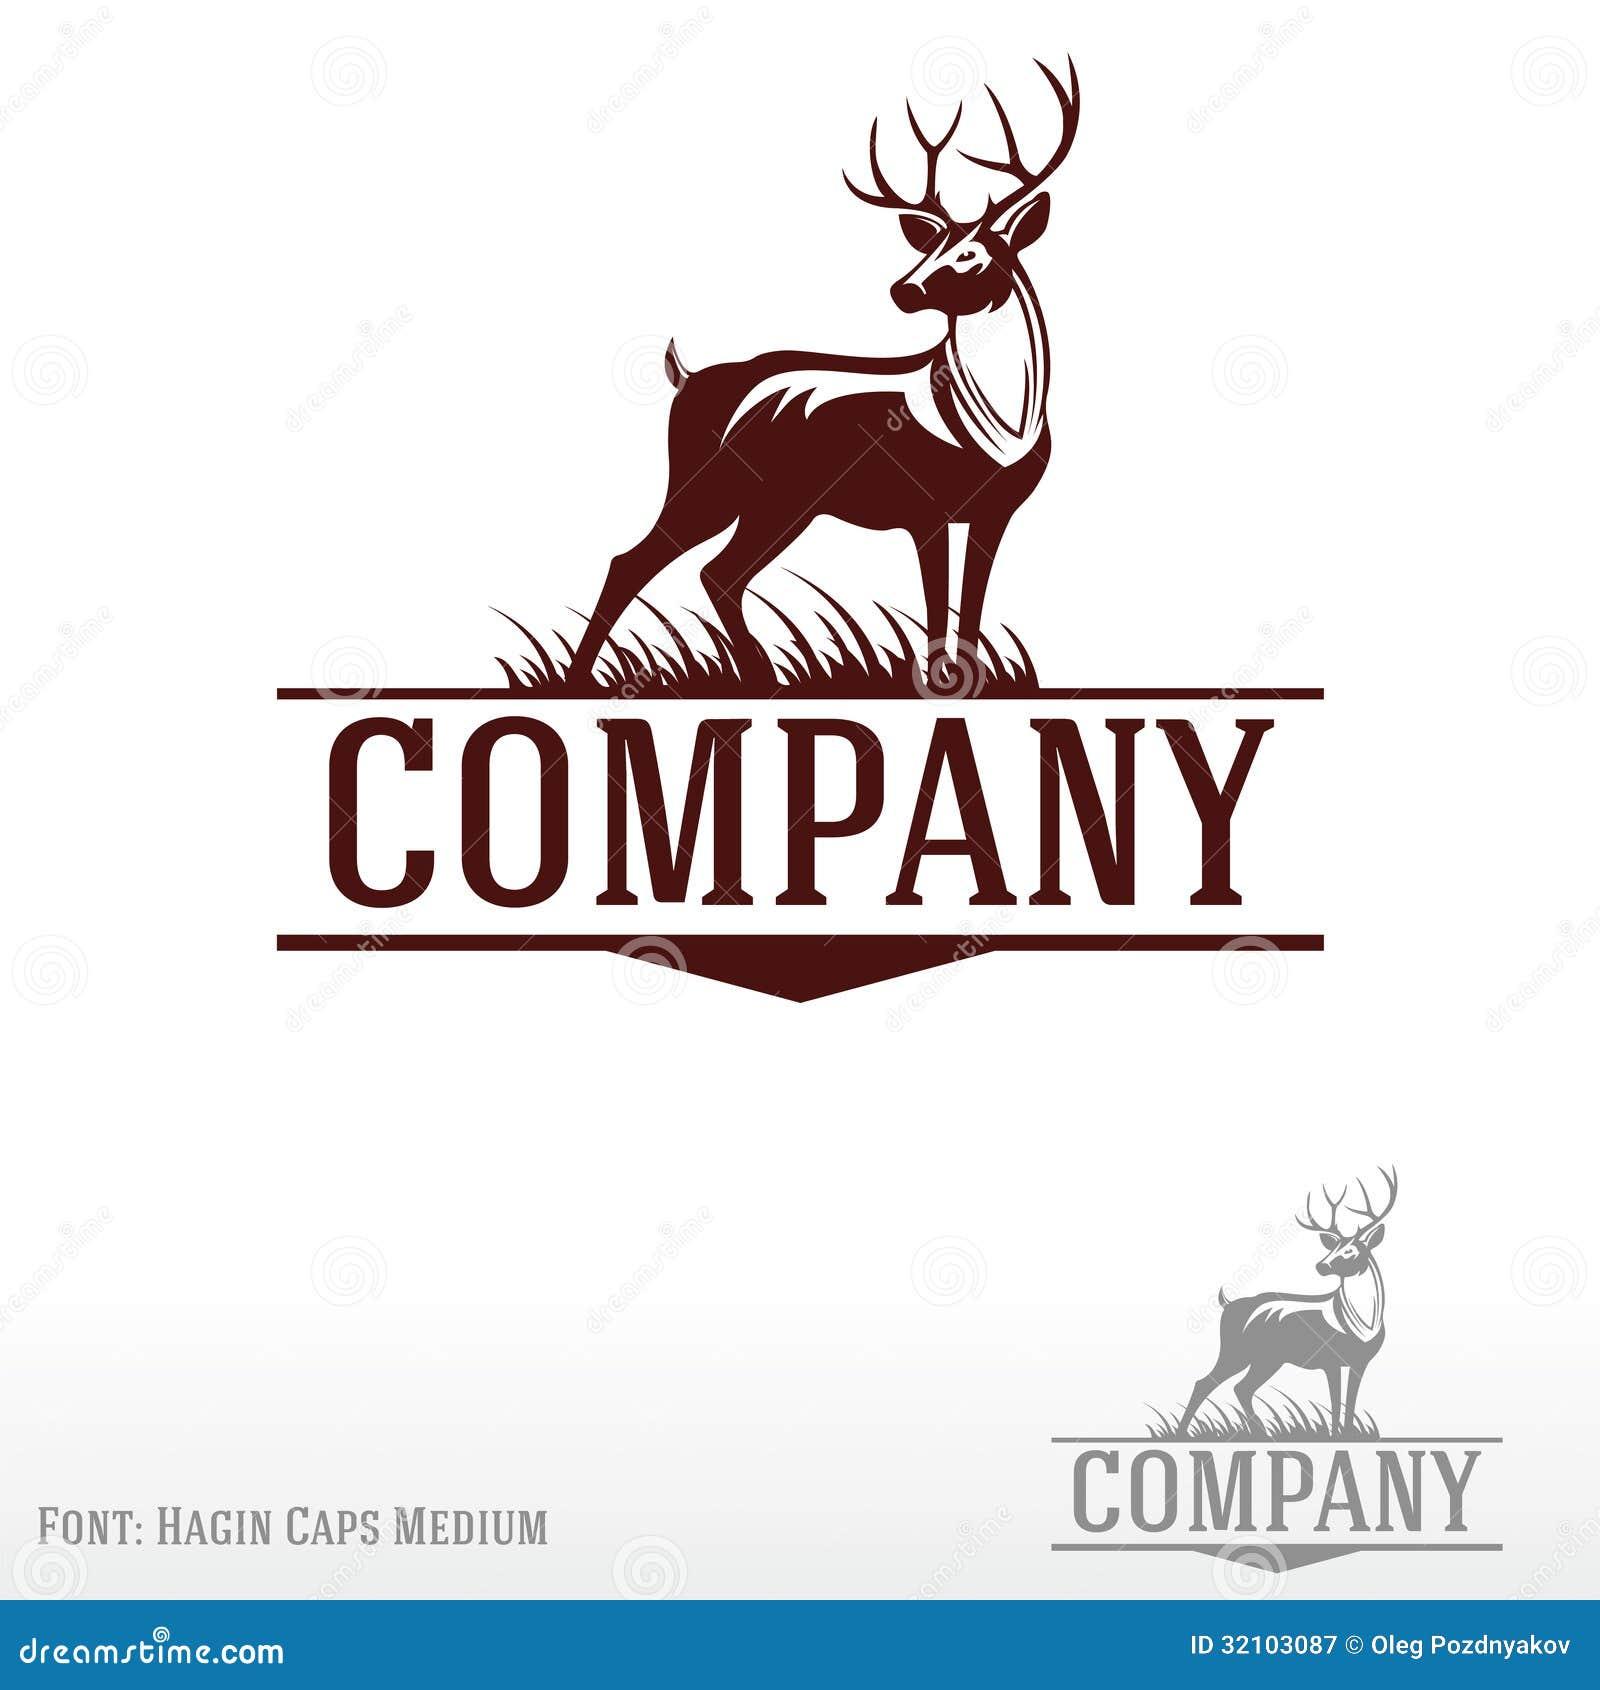 Deer Logo Royalty Free Stock Photography - Image: 32103087